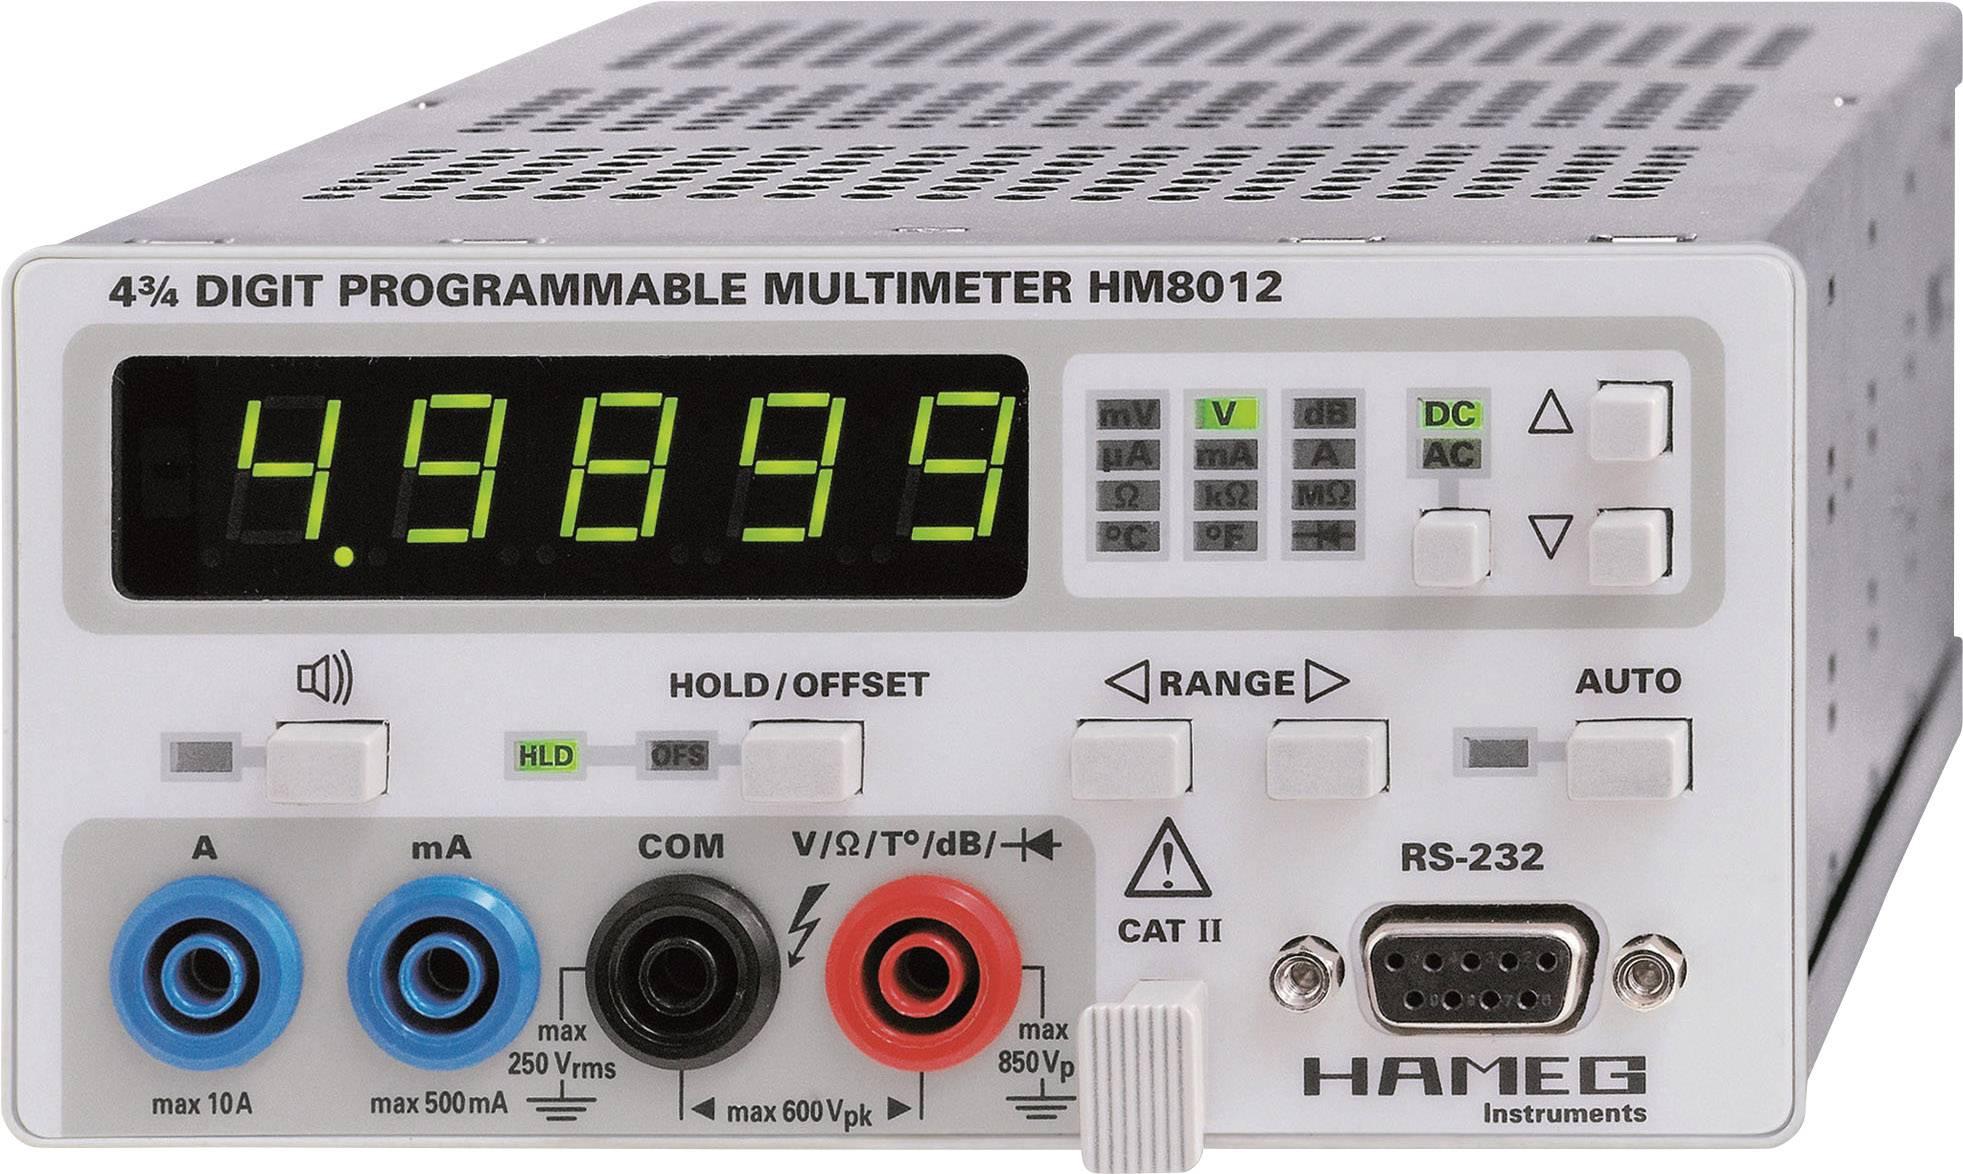 Digitálne/y stolný mutlimeter Rohde & Schwarz HM8012 3593.0768K02